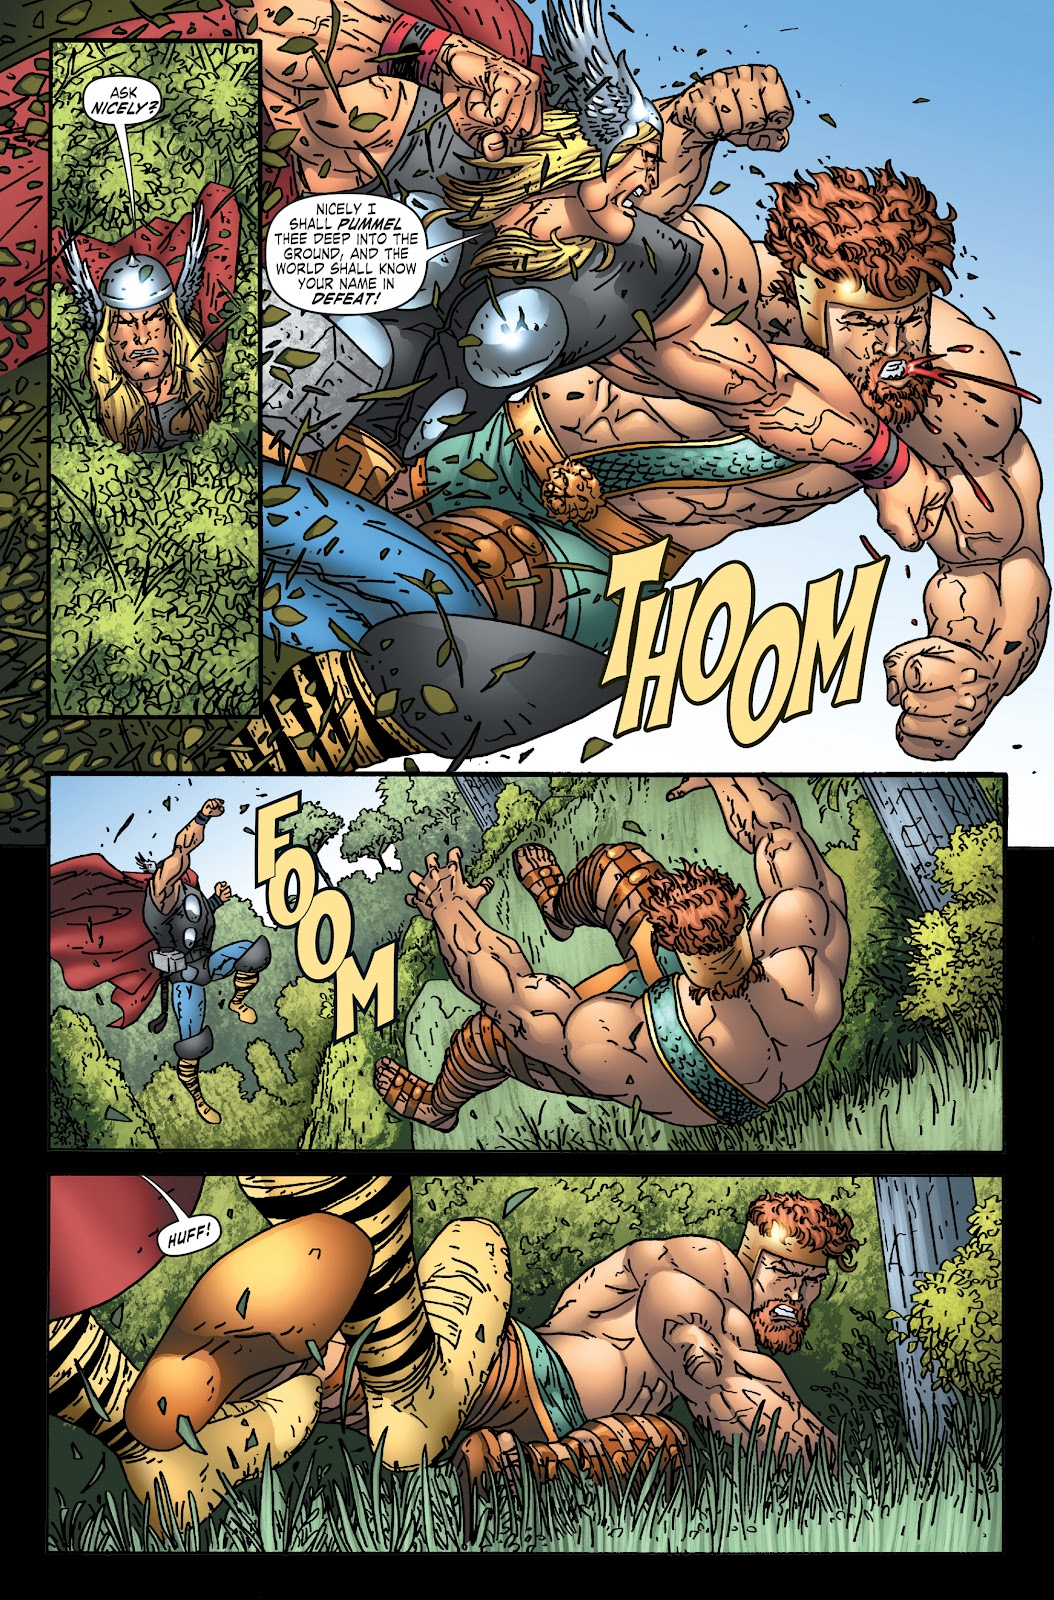 Read online Thor: Ragnaroks comic -  Issue # TPB (Part 1) - 58